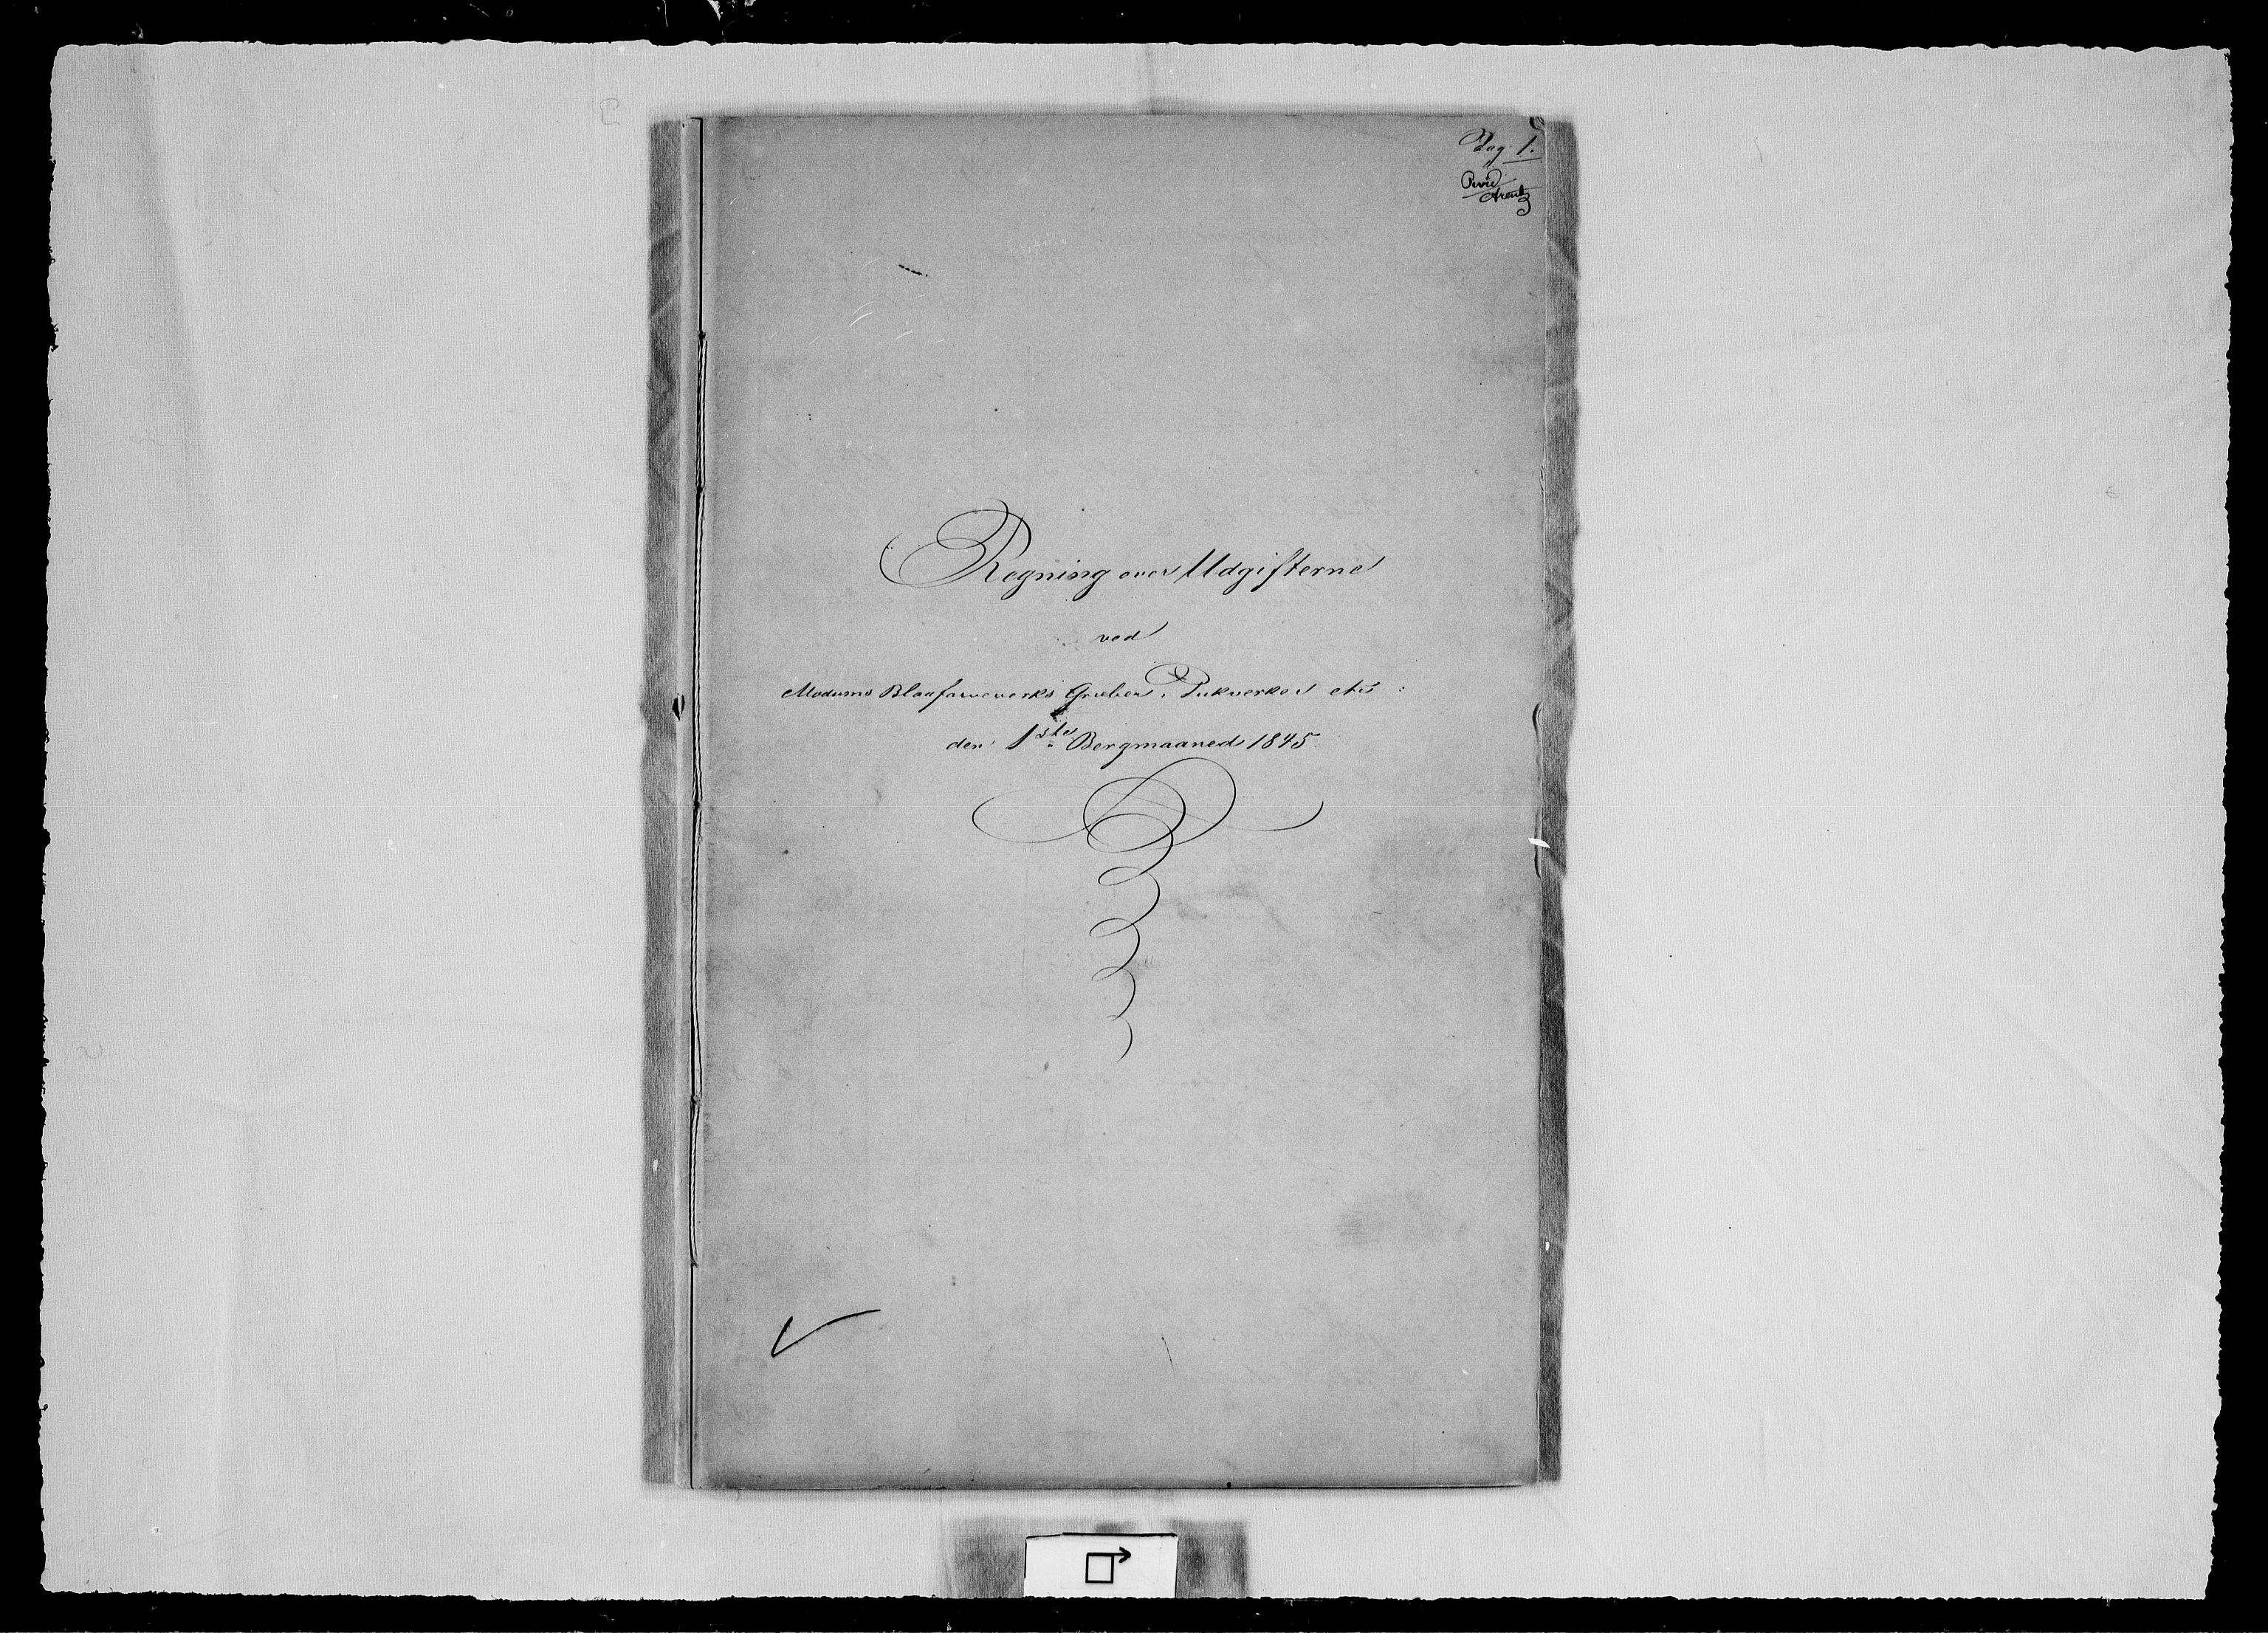 RA, Modums Blaafarveværk, G/Gd/Gdd/L0271, 1845, s. 2